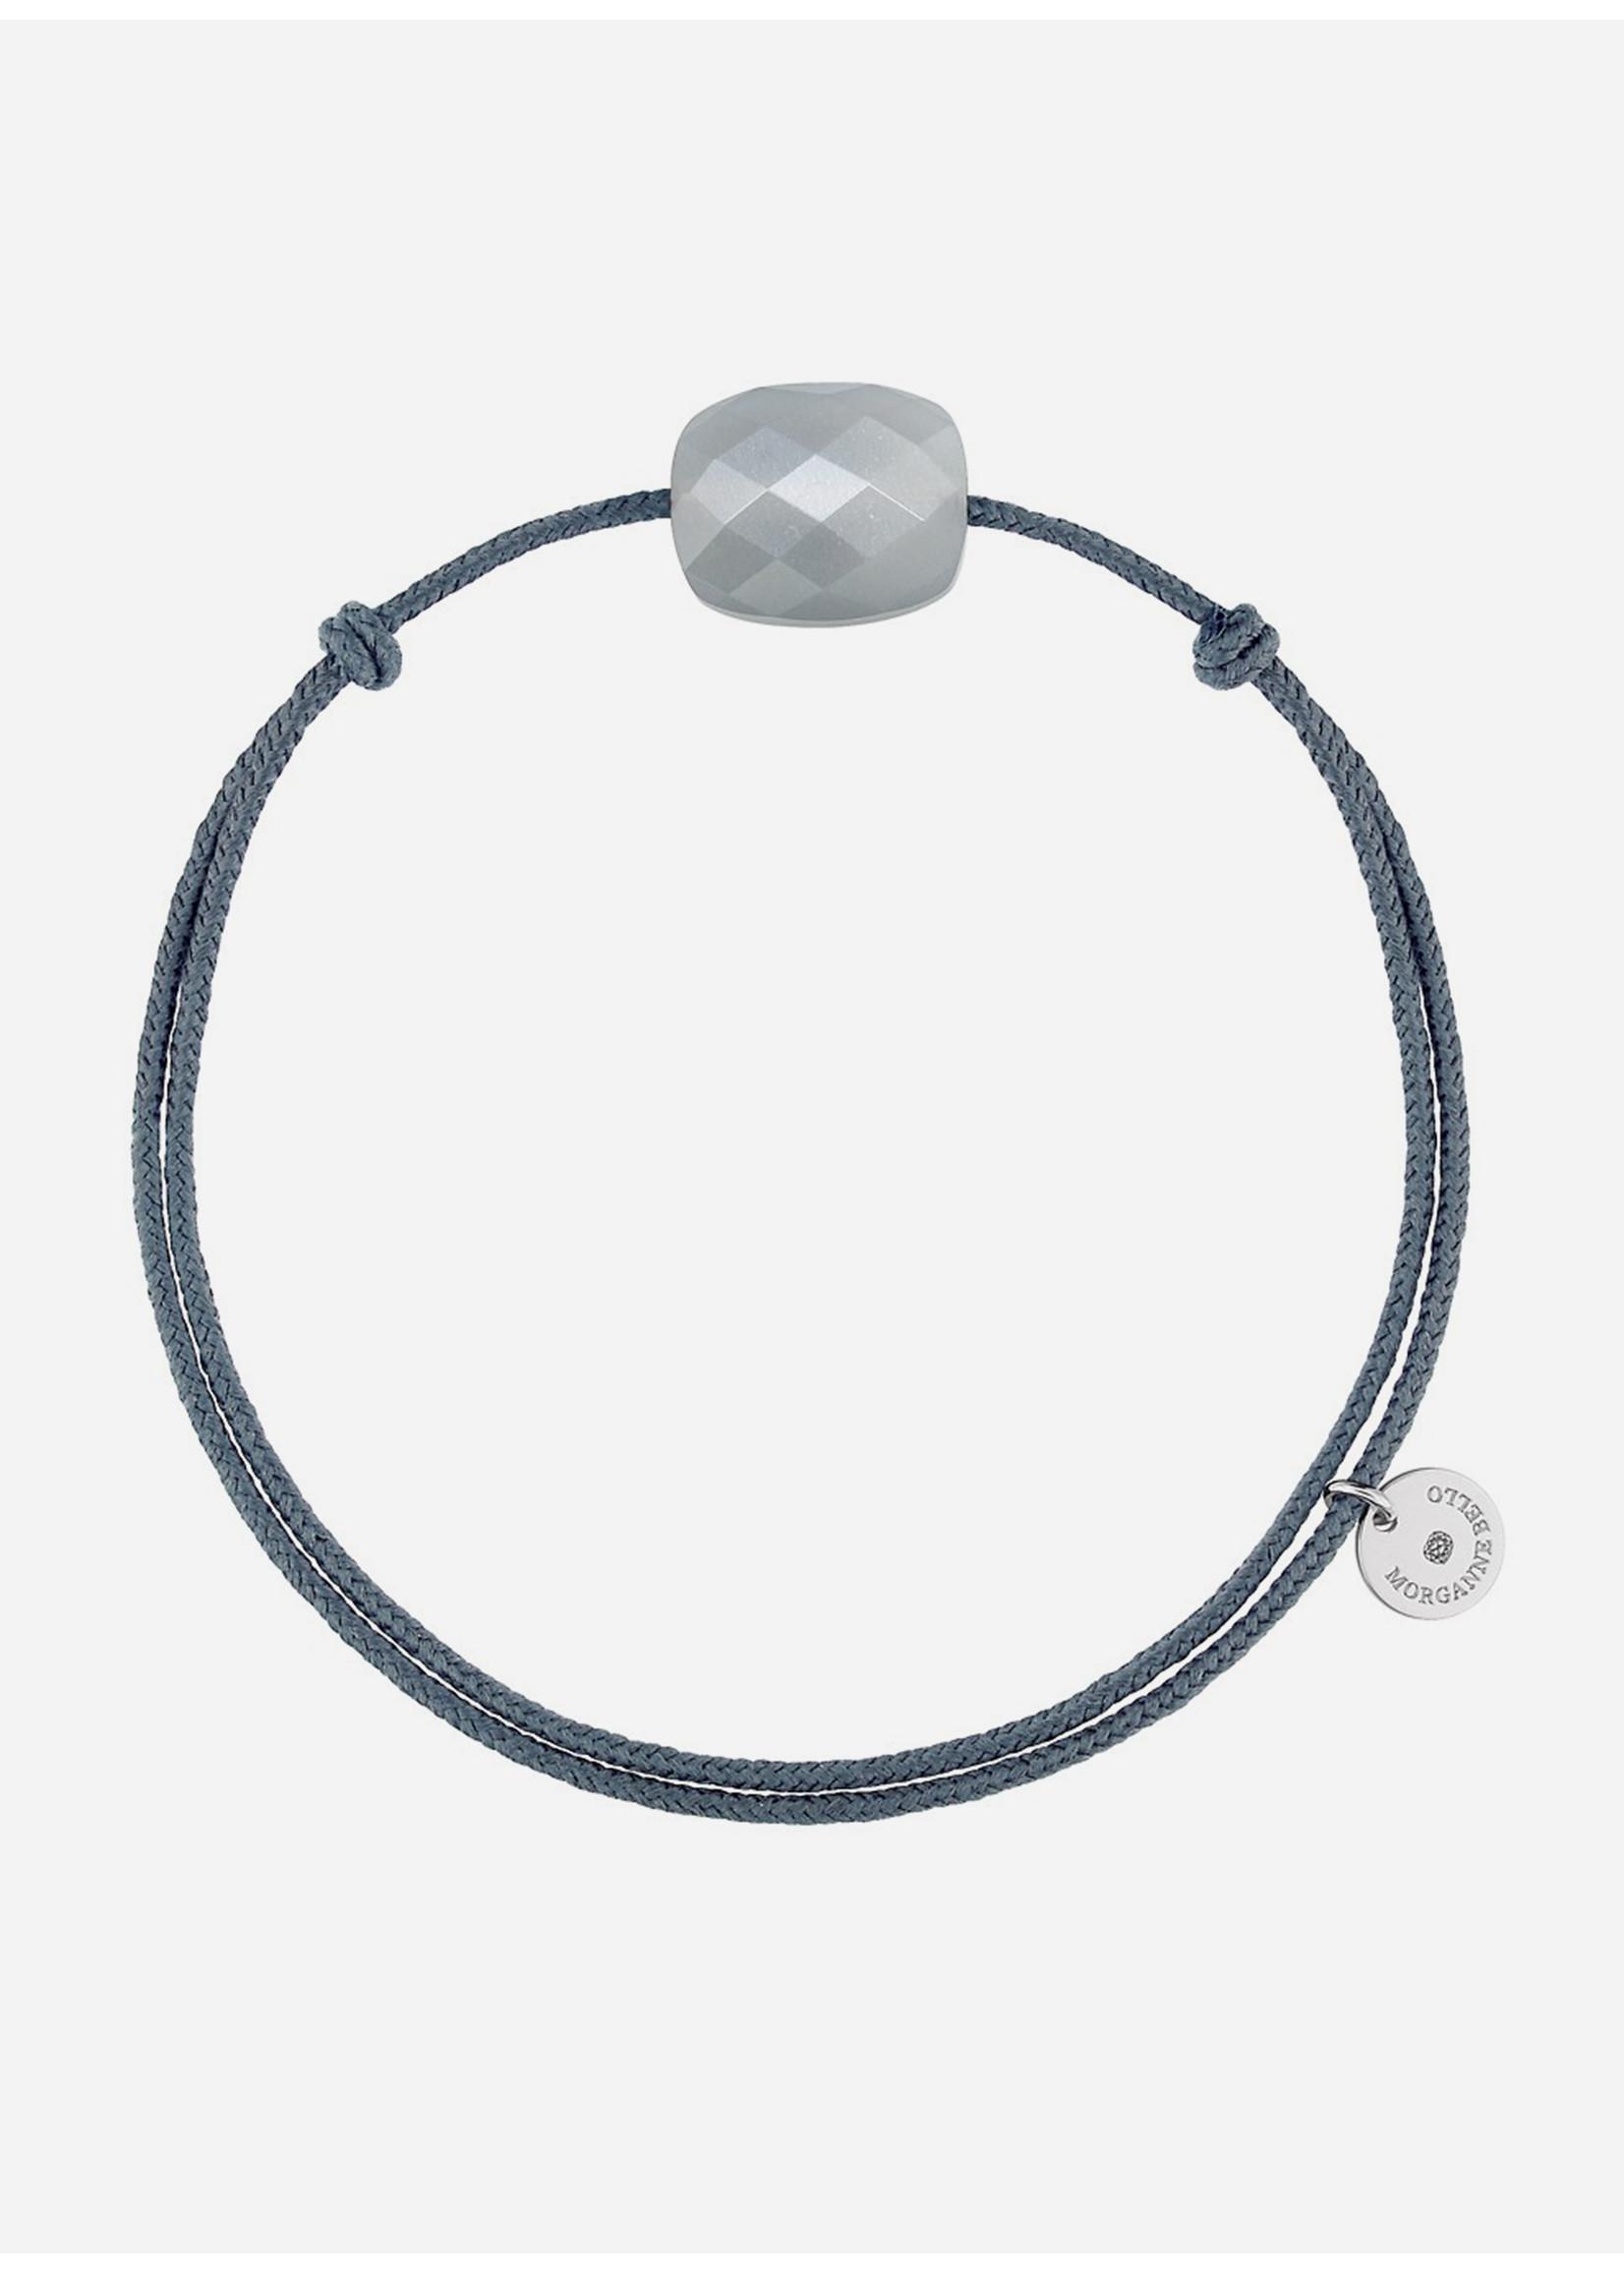 Morganne Bello Cushion grey moonstone bracelet